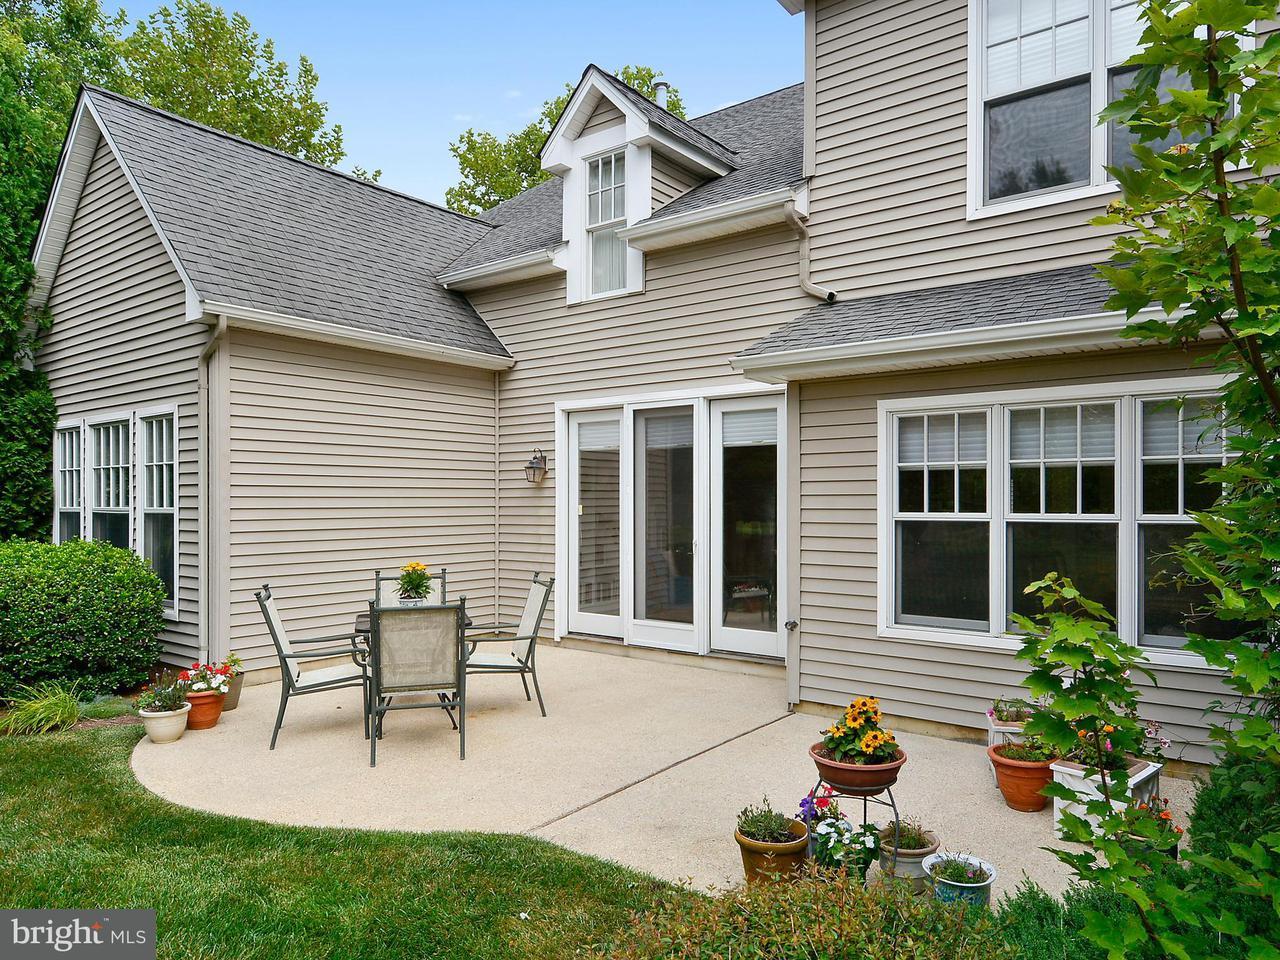 Additional photo for property listing at 28867 Jasper Lane 28867 Jasper Lane Easton, Maryland 21601 États-Unis